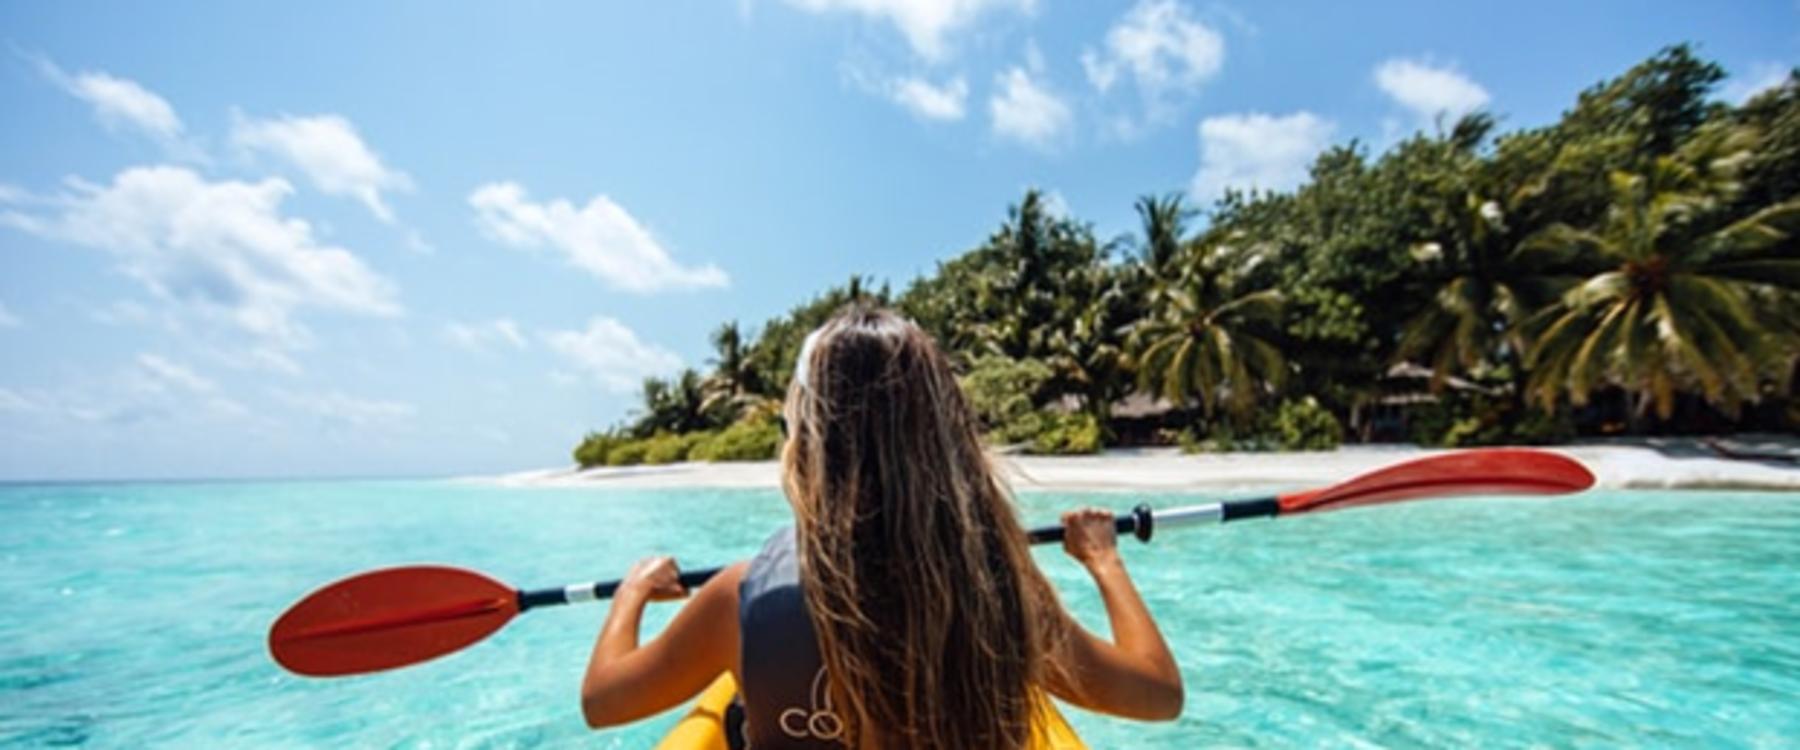 kayaking, gear, adventure, river trip